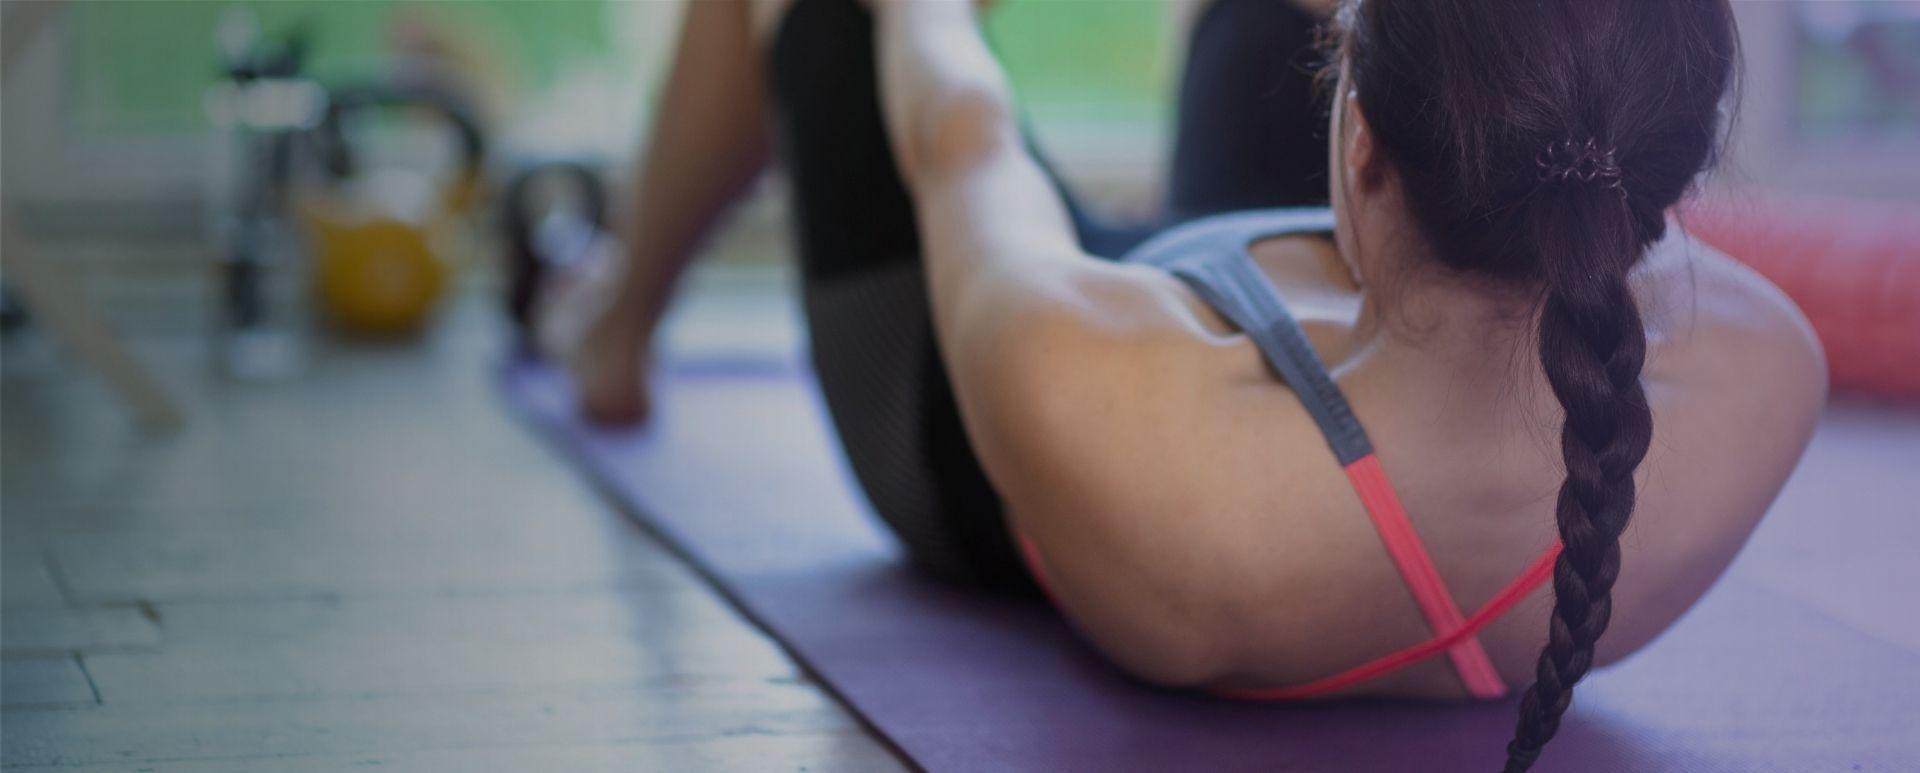 fitness-a-casa-per-dimagrire-7-esercizi-indispensabili